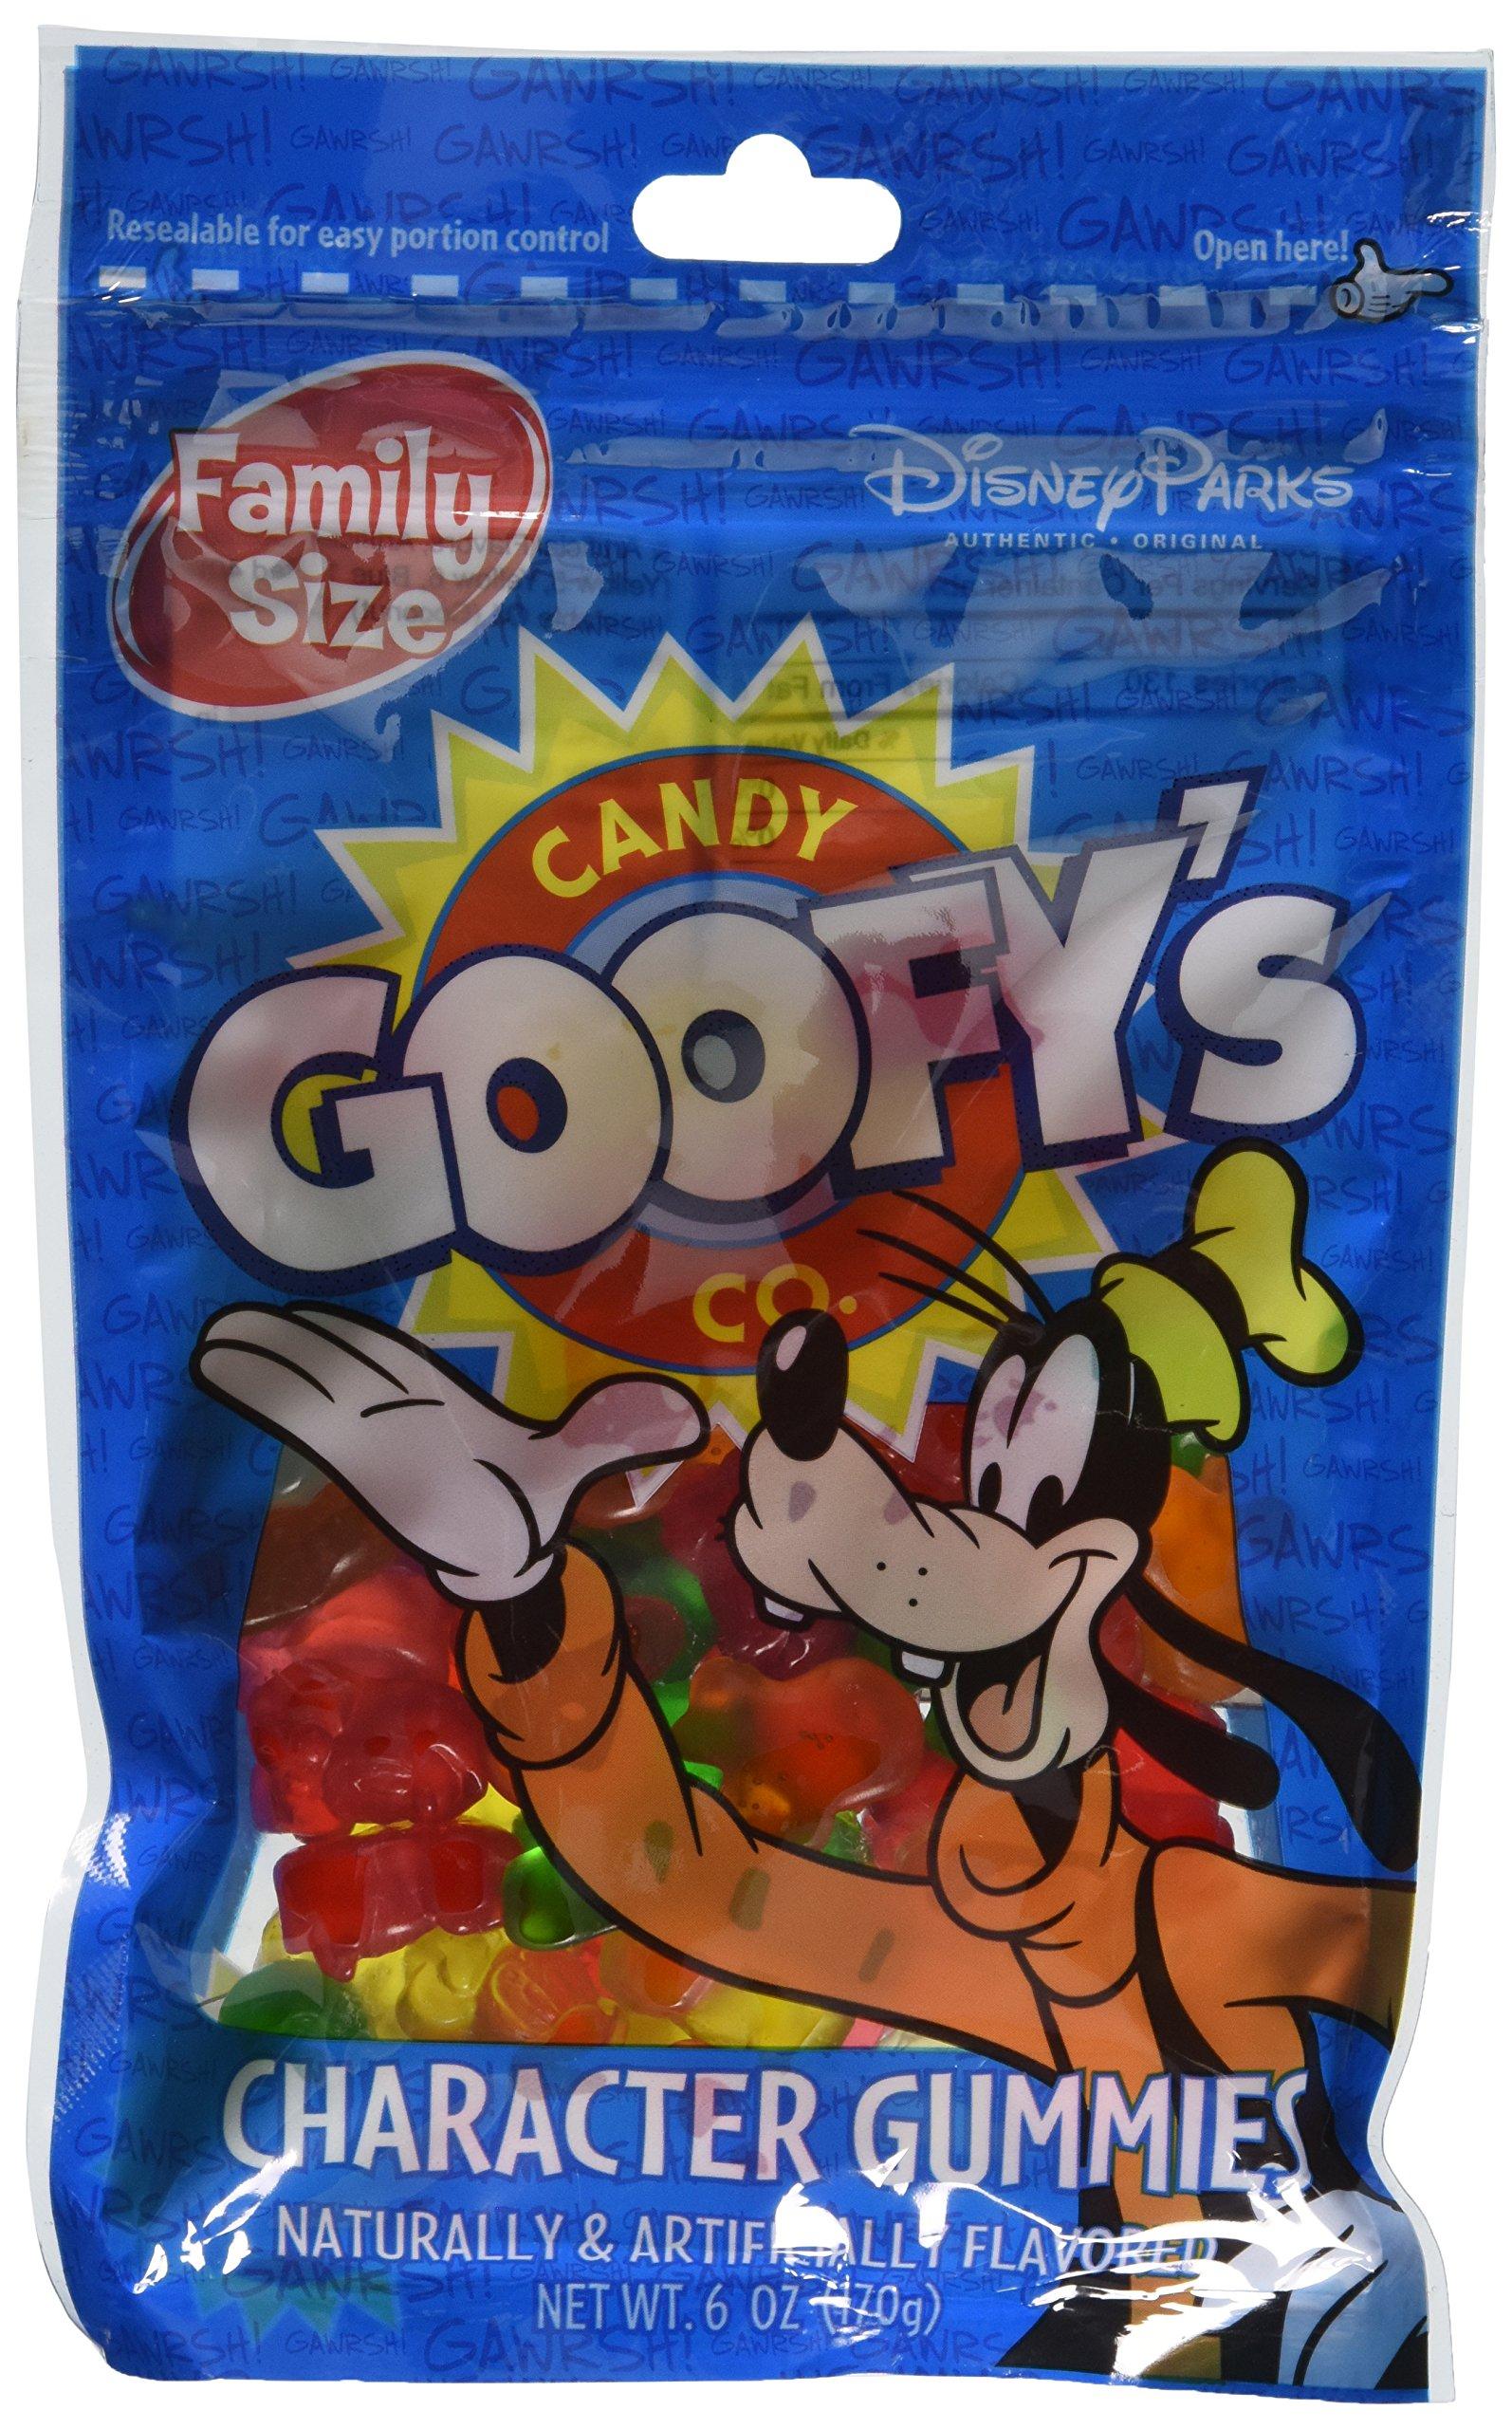 Disney Goofy's Candy Company Mickey Mouse Character Gummies 6oz Bag